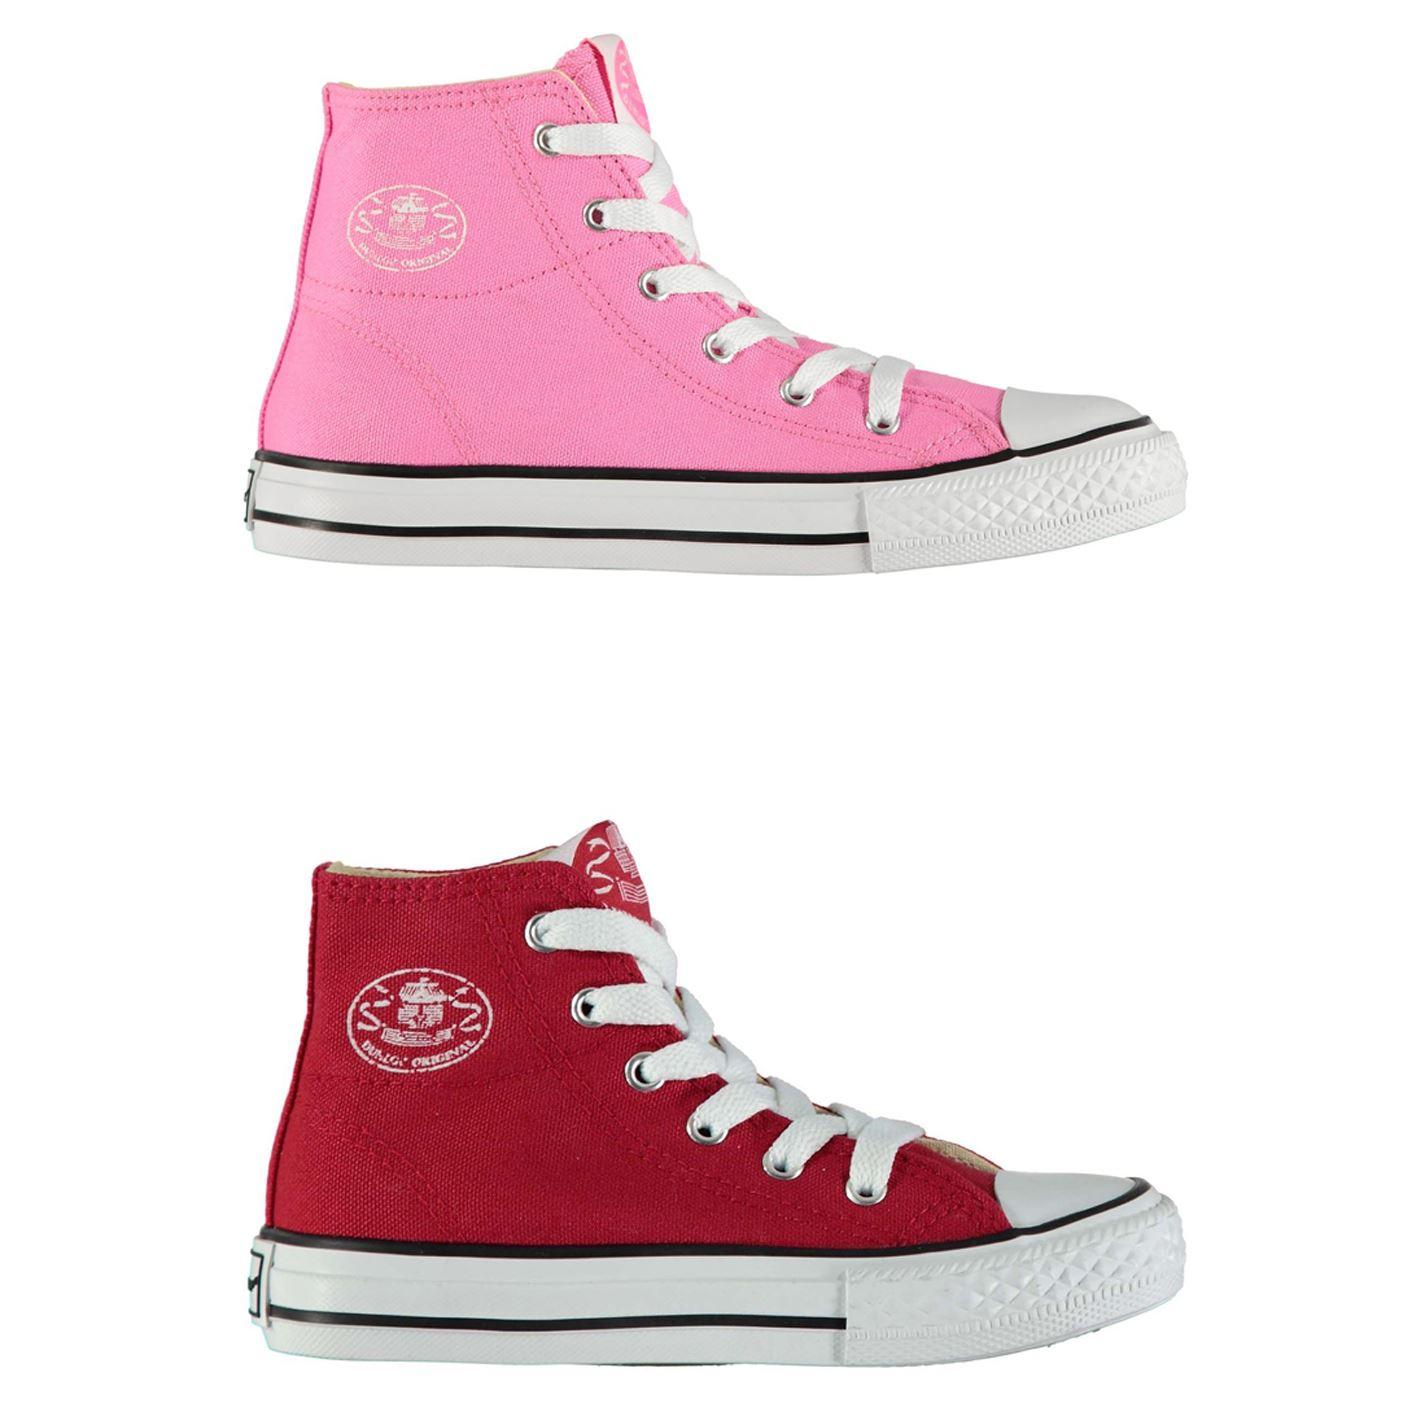 f12e702298620 ... Dunlop Kids Canvas High Top Trainers Girls Shoes Footwear ...